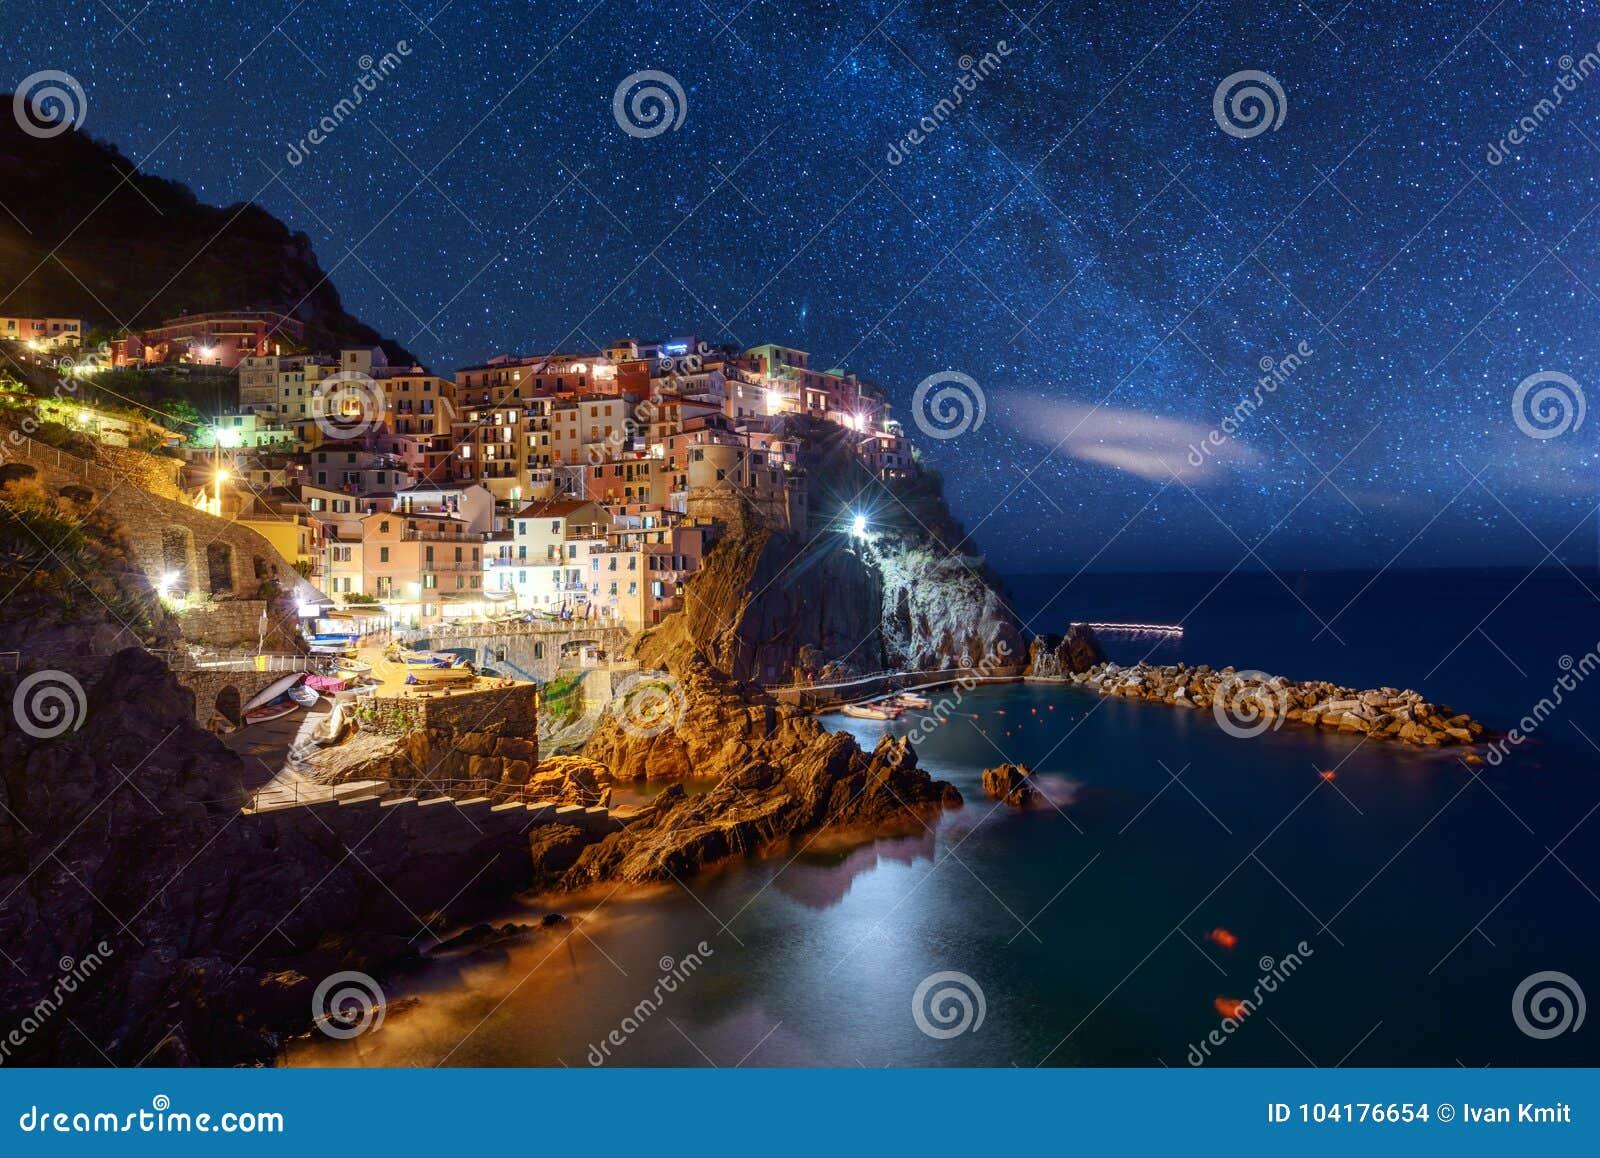 Download Amazing View Of Manarola City At Evening Light Stock Photo